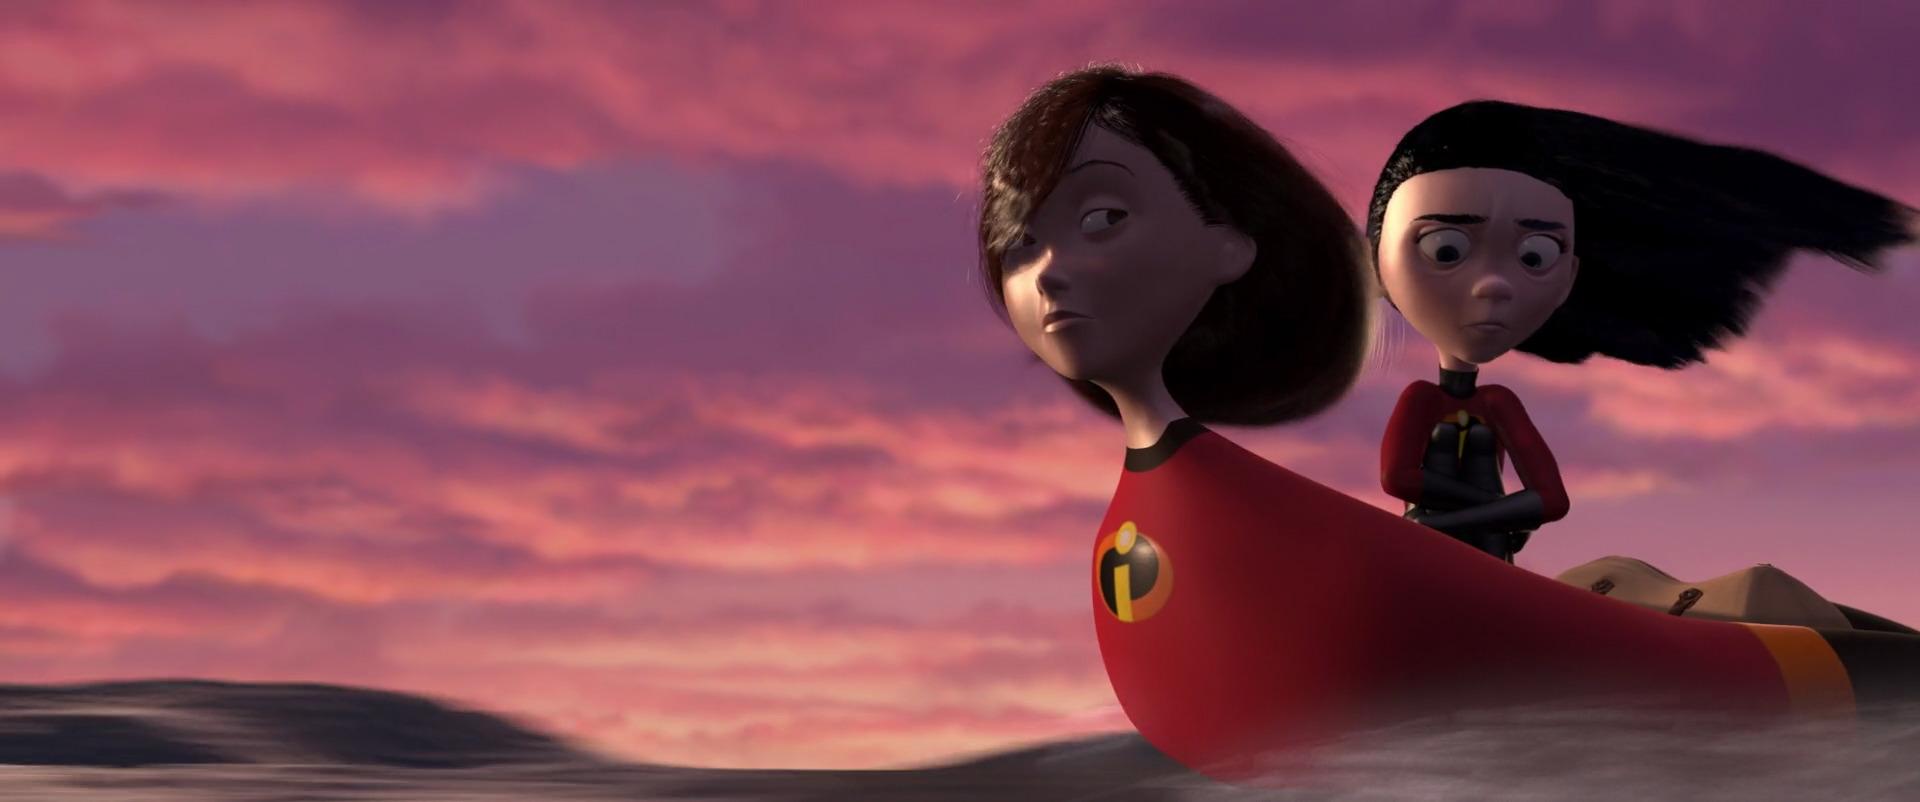 Elastigirl personnage dans les indestructibles pixar for Chaise game free download